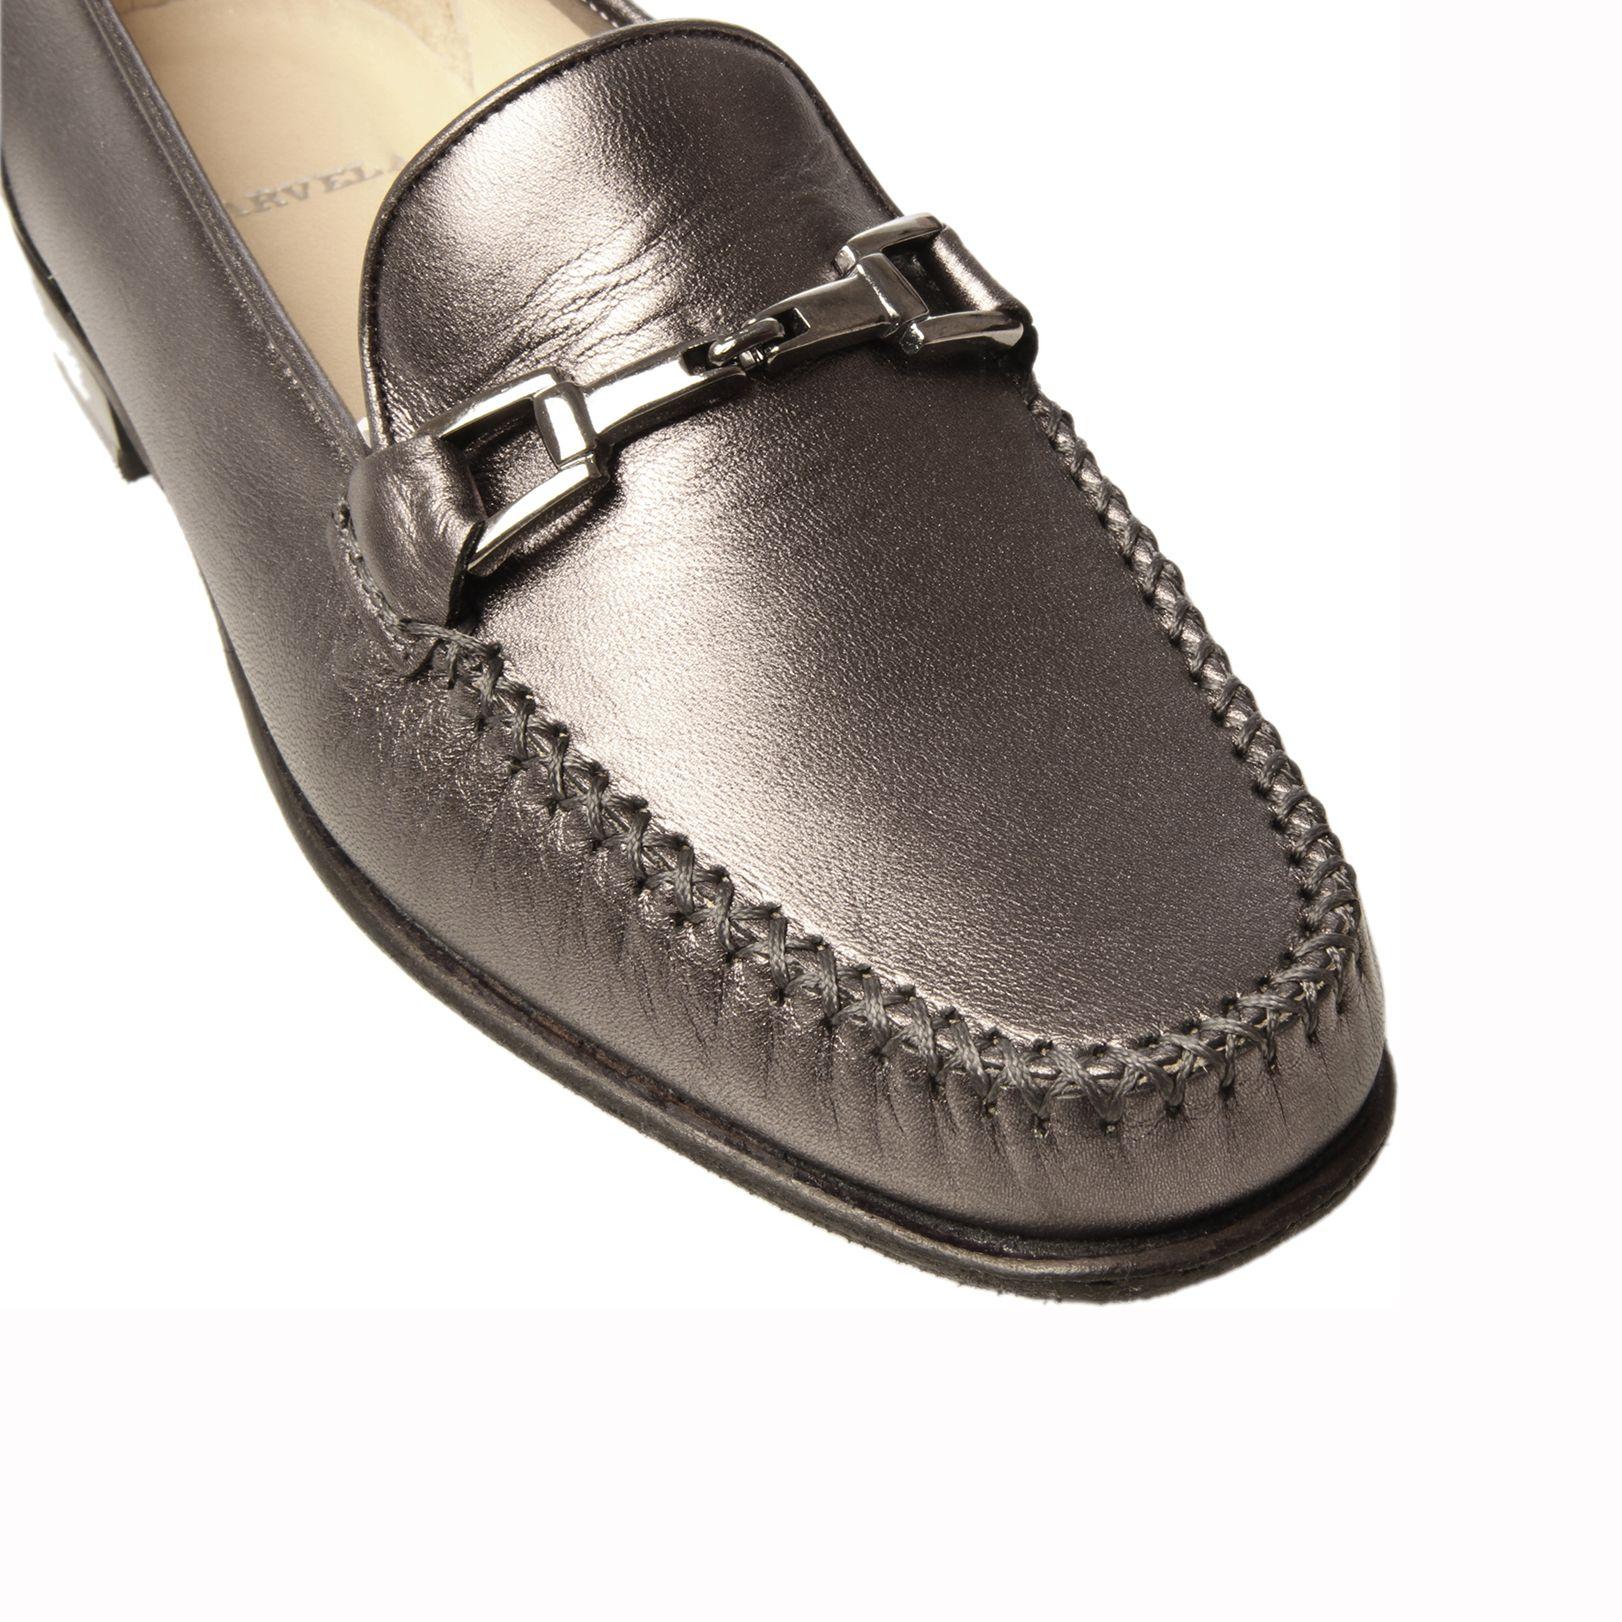 Latest Carvela Shoes For Men